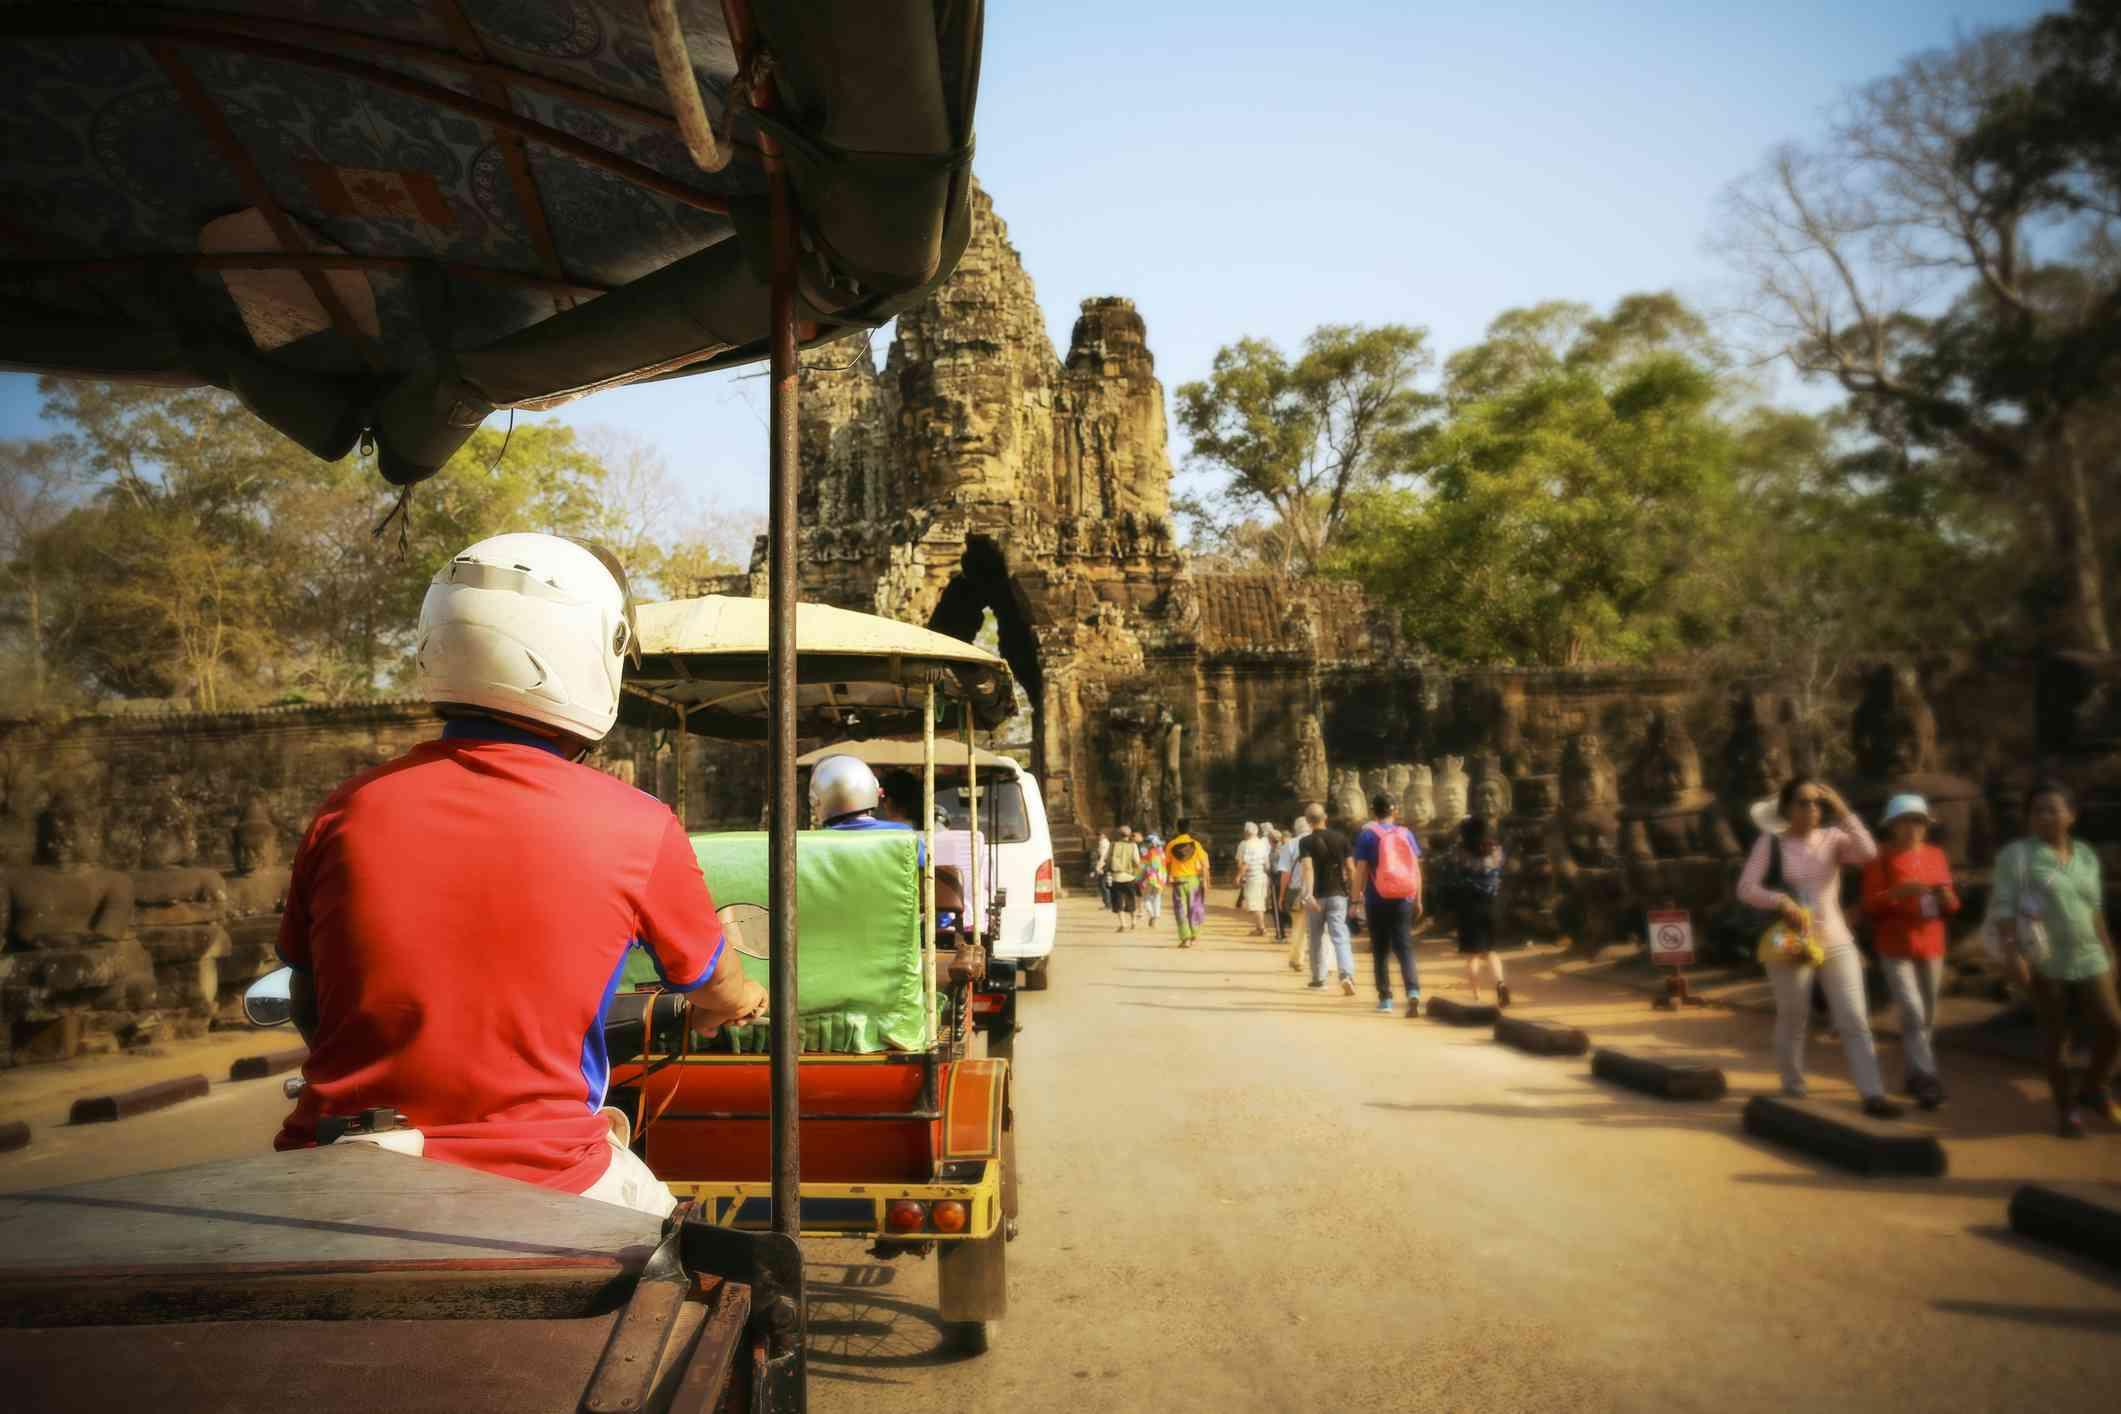 Cambodia, Siem Reap, Angkor Wat, driving tuk tuk